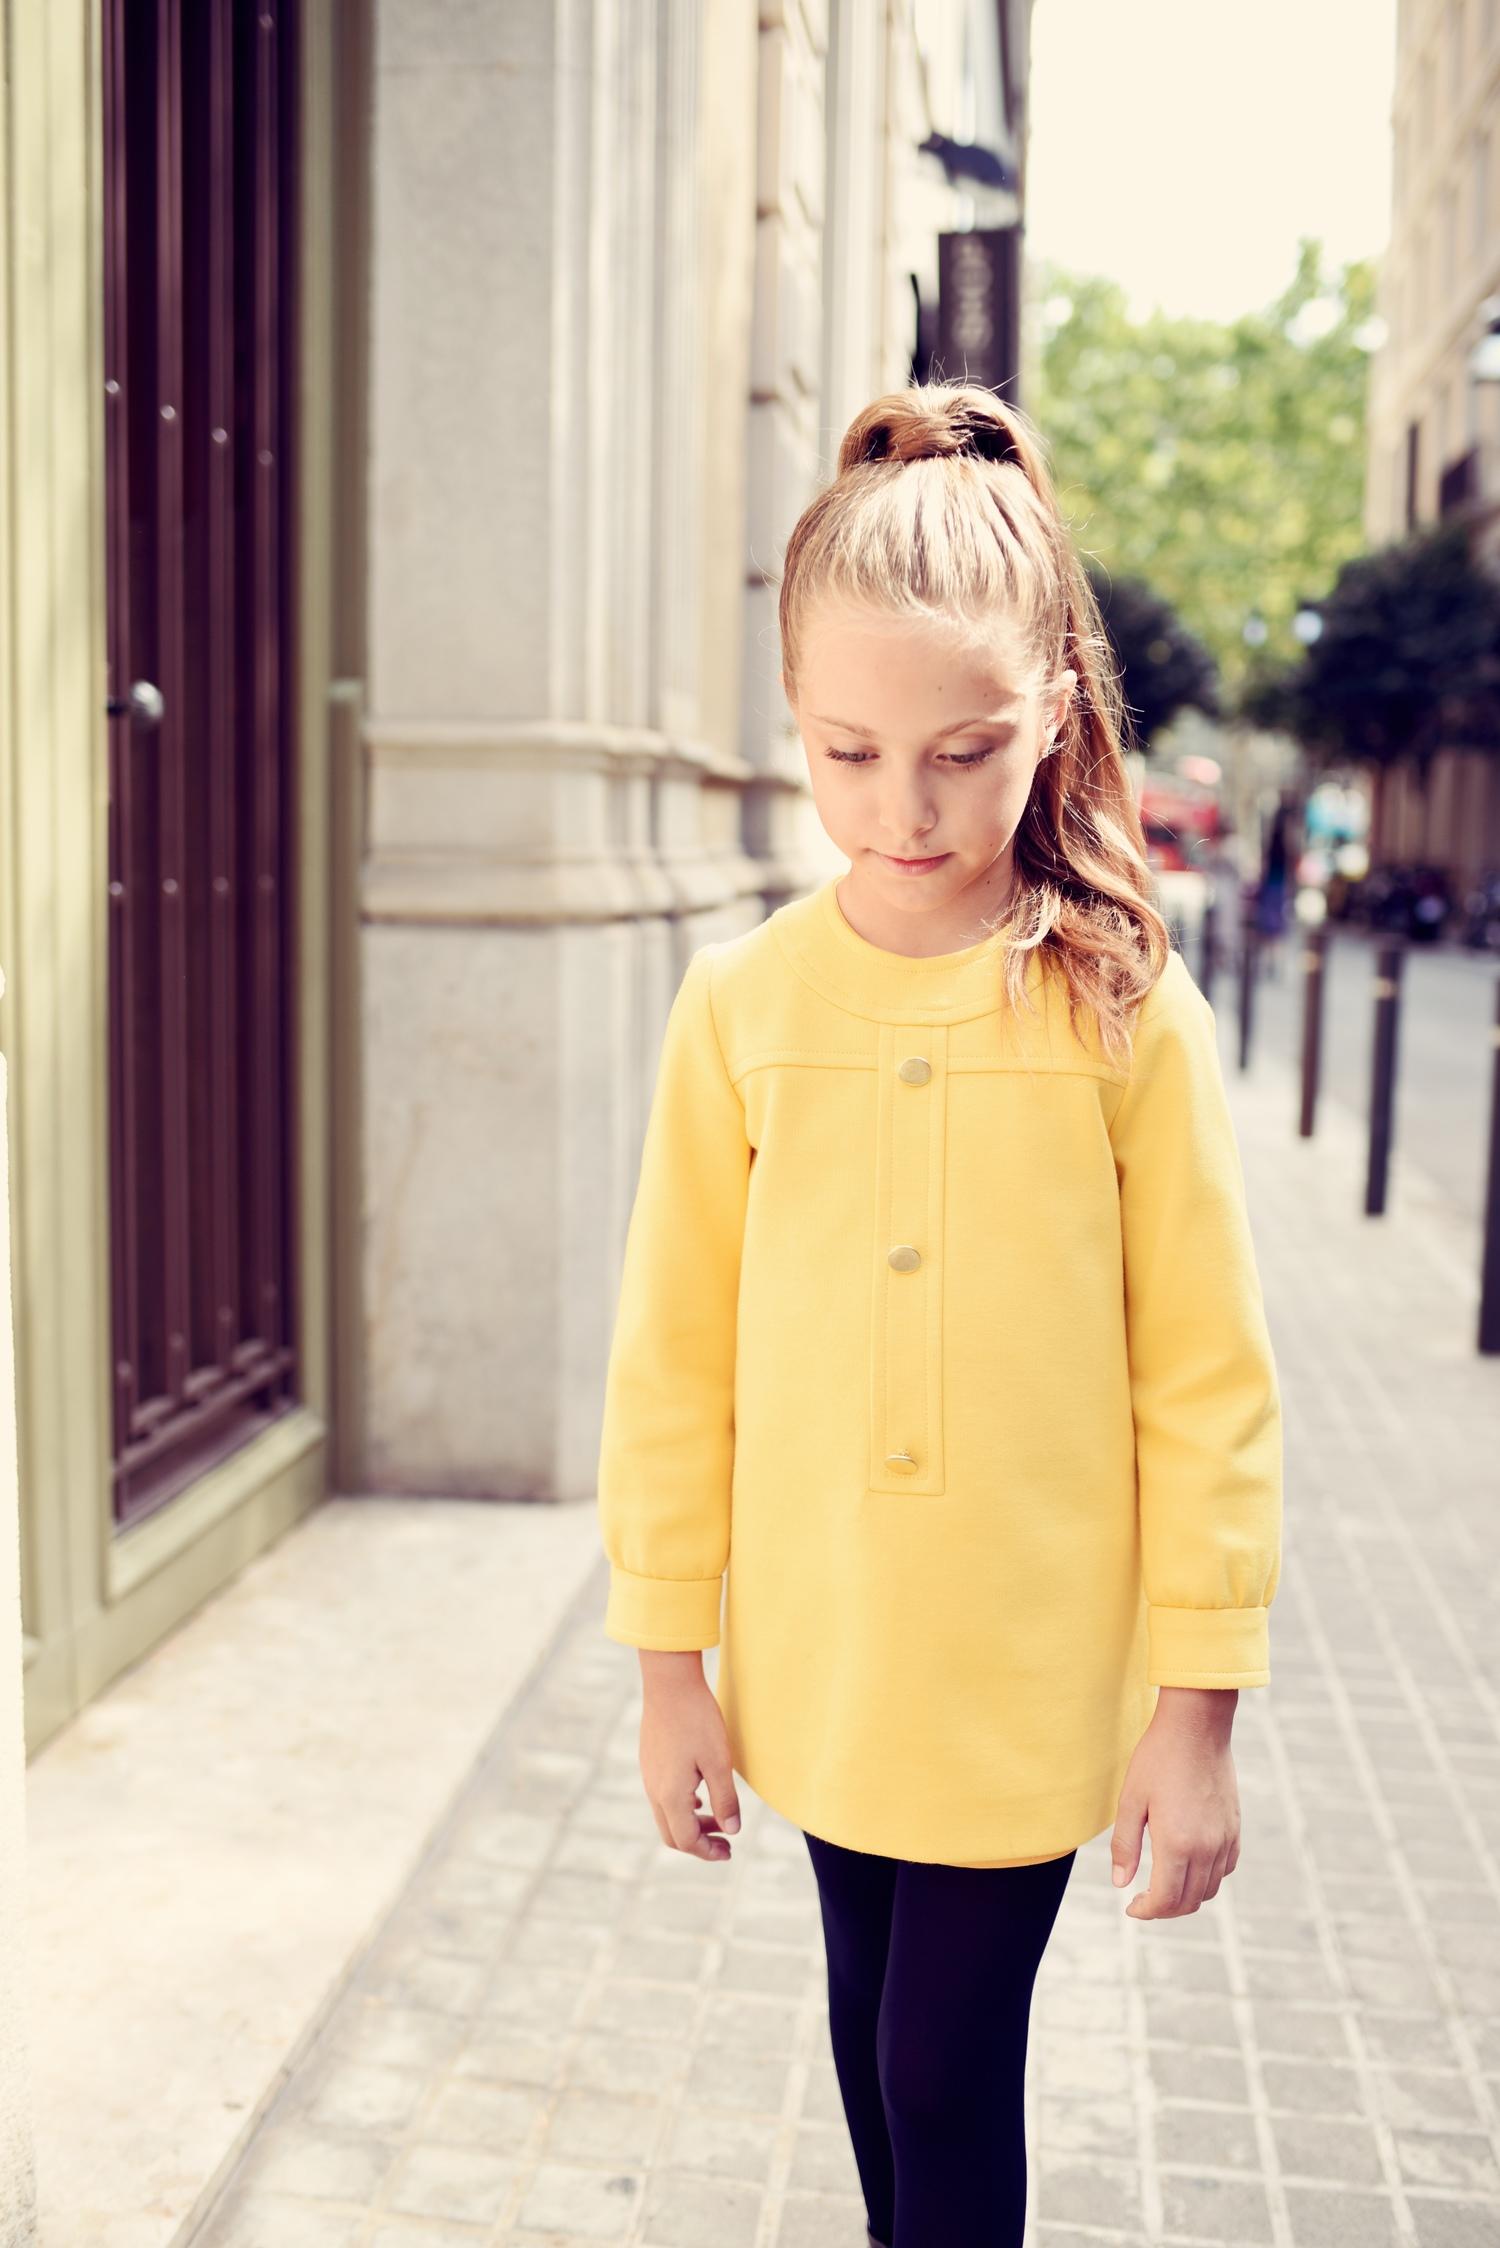 Enfant+Street+Style+by+Gina+Kim+Photography-6.jpeg